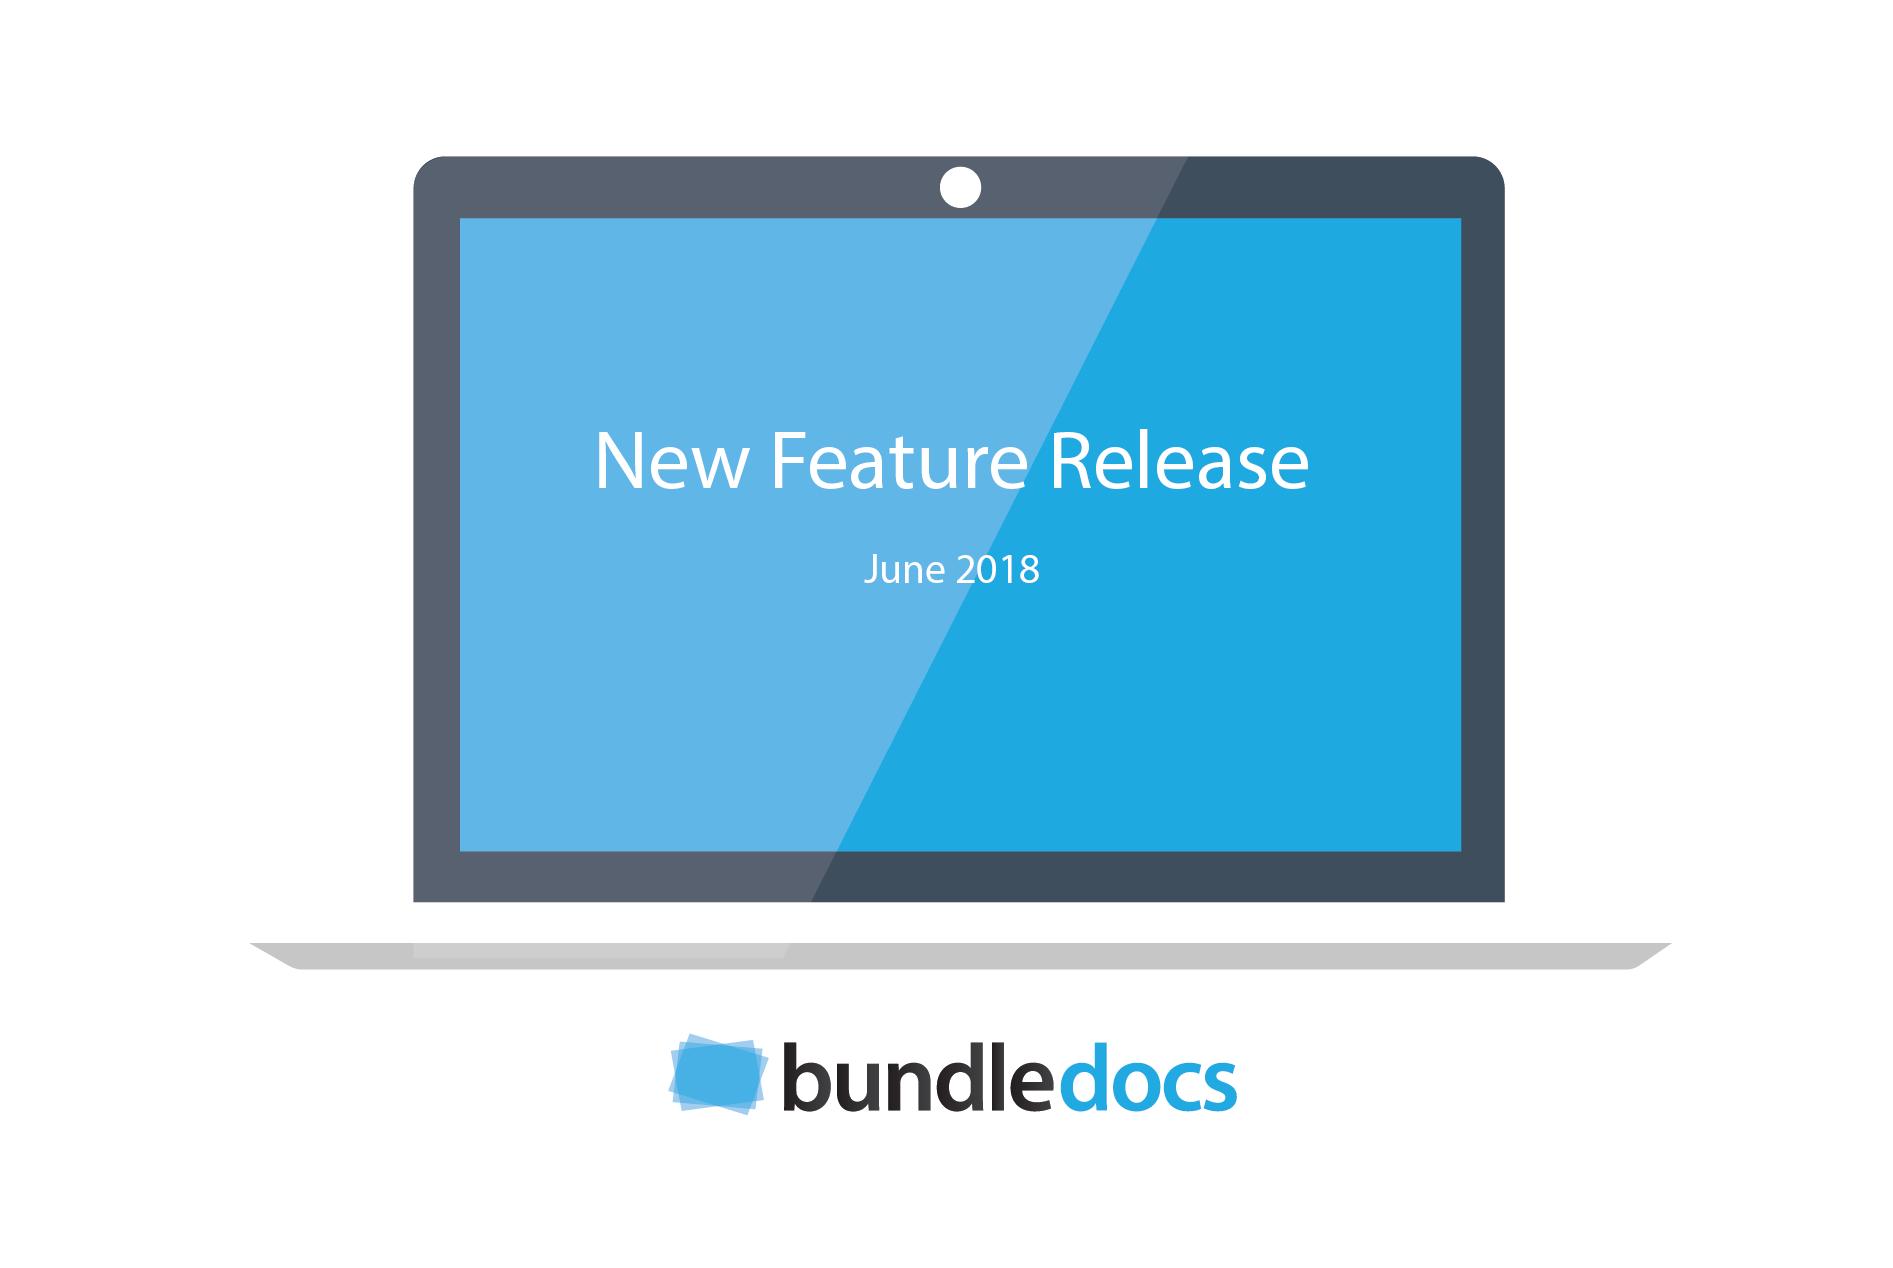 Bundledocs_New_Feature_Release_June_2018.png